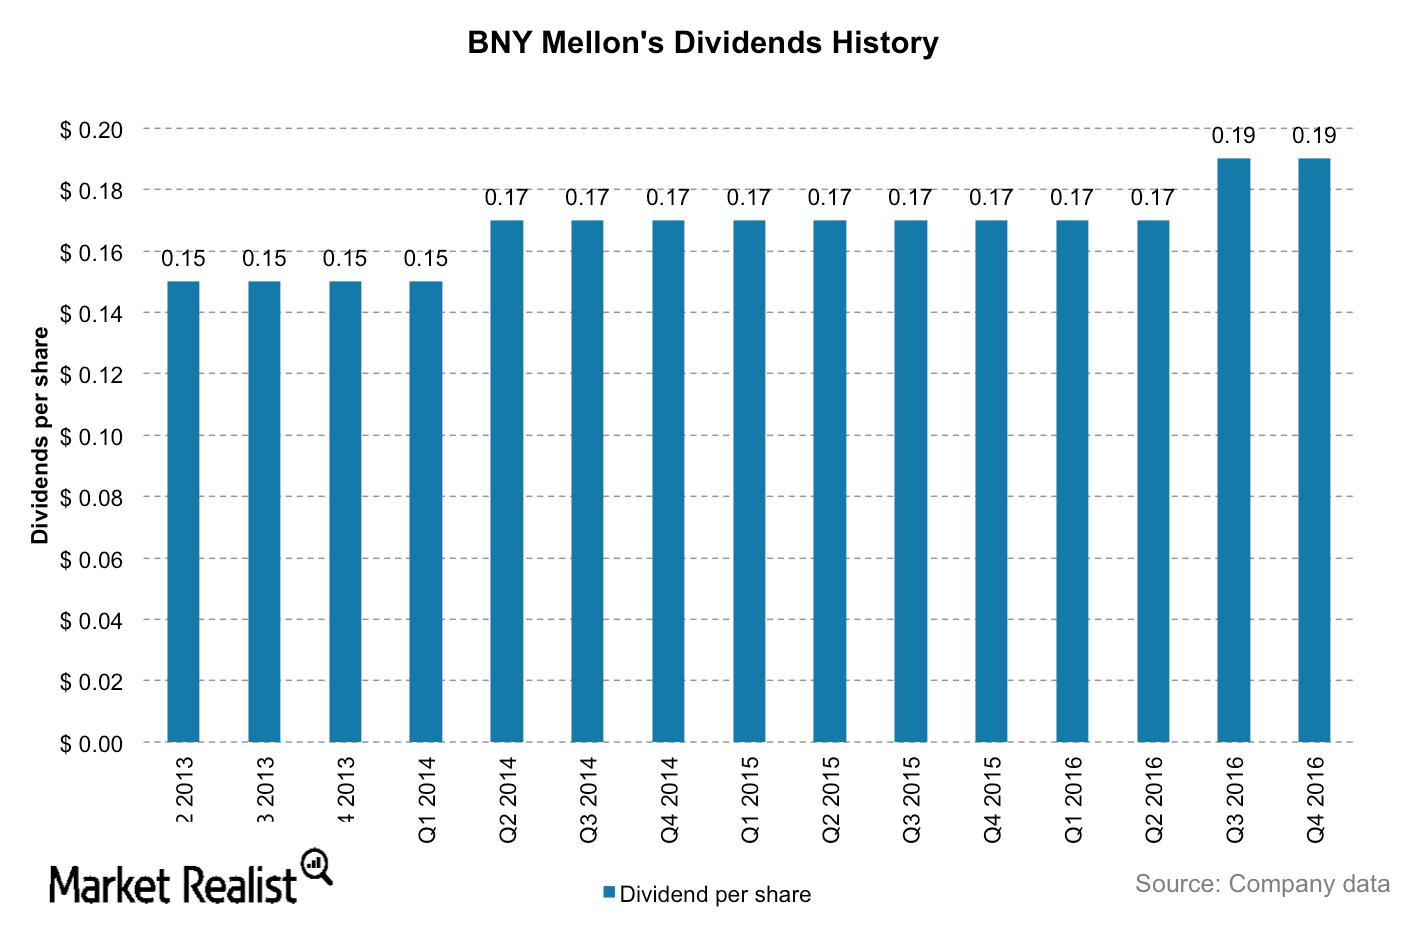 uploads///BNY MEllon dividends